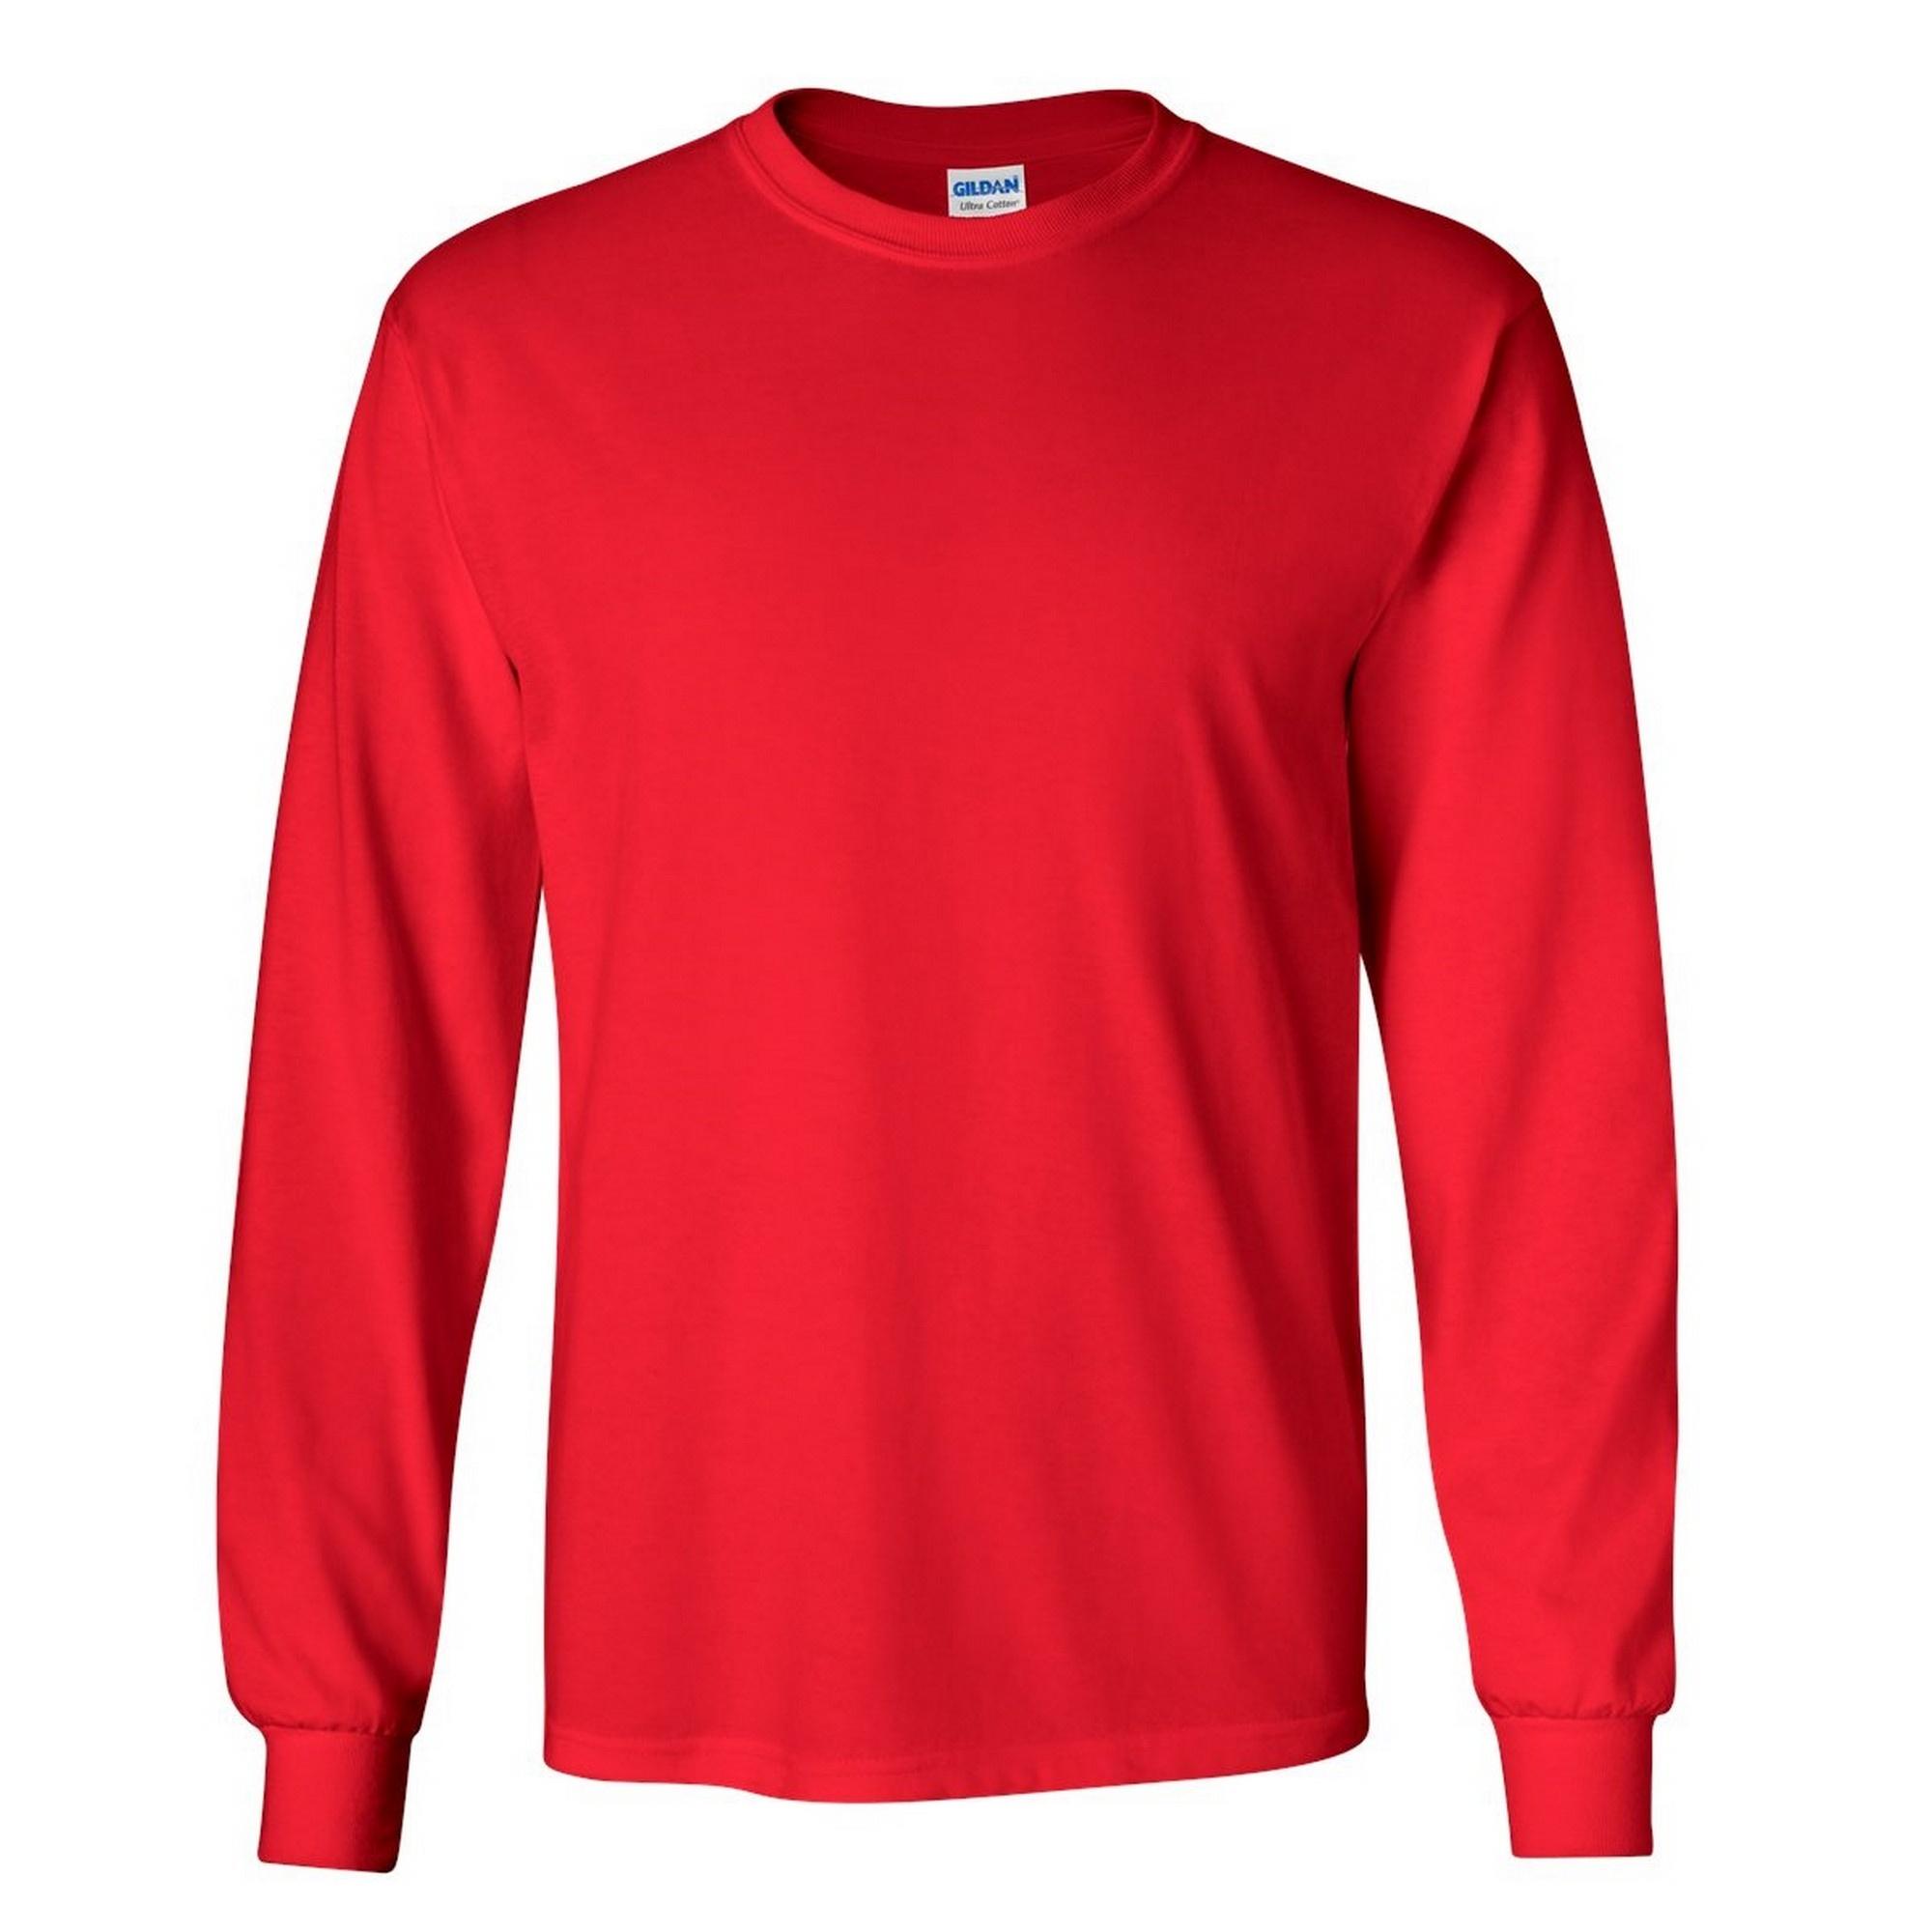 Gildan Mens Plain Crew Neck Ultra Cotton Long Sleeve T-Shirt | eBay